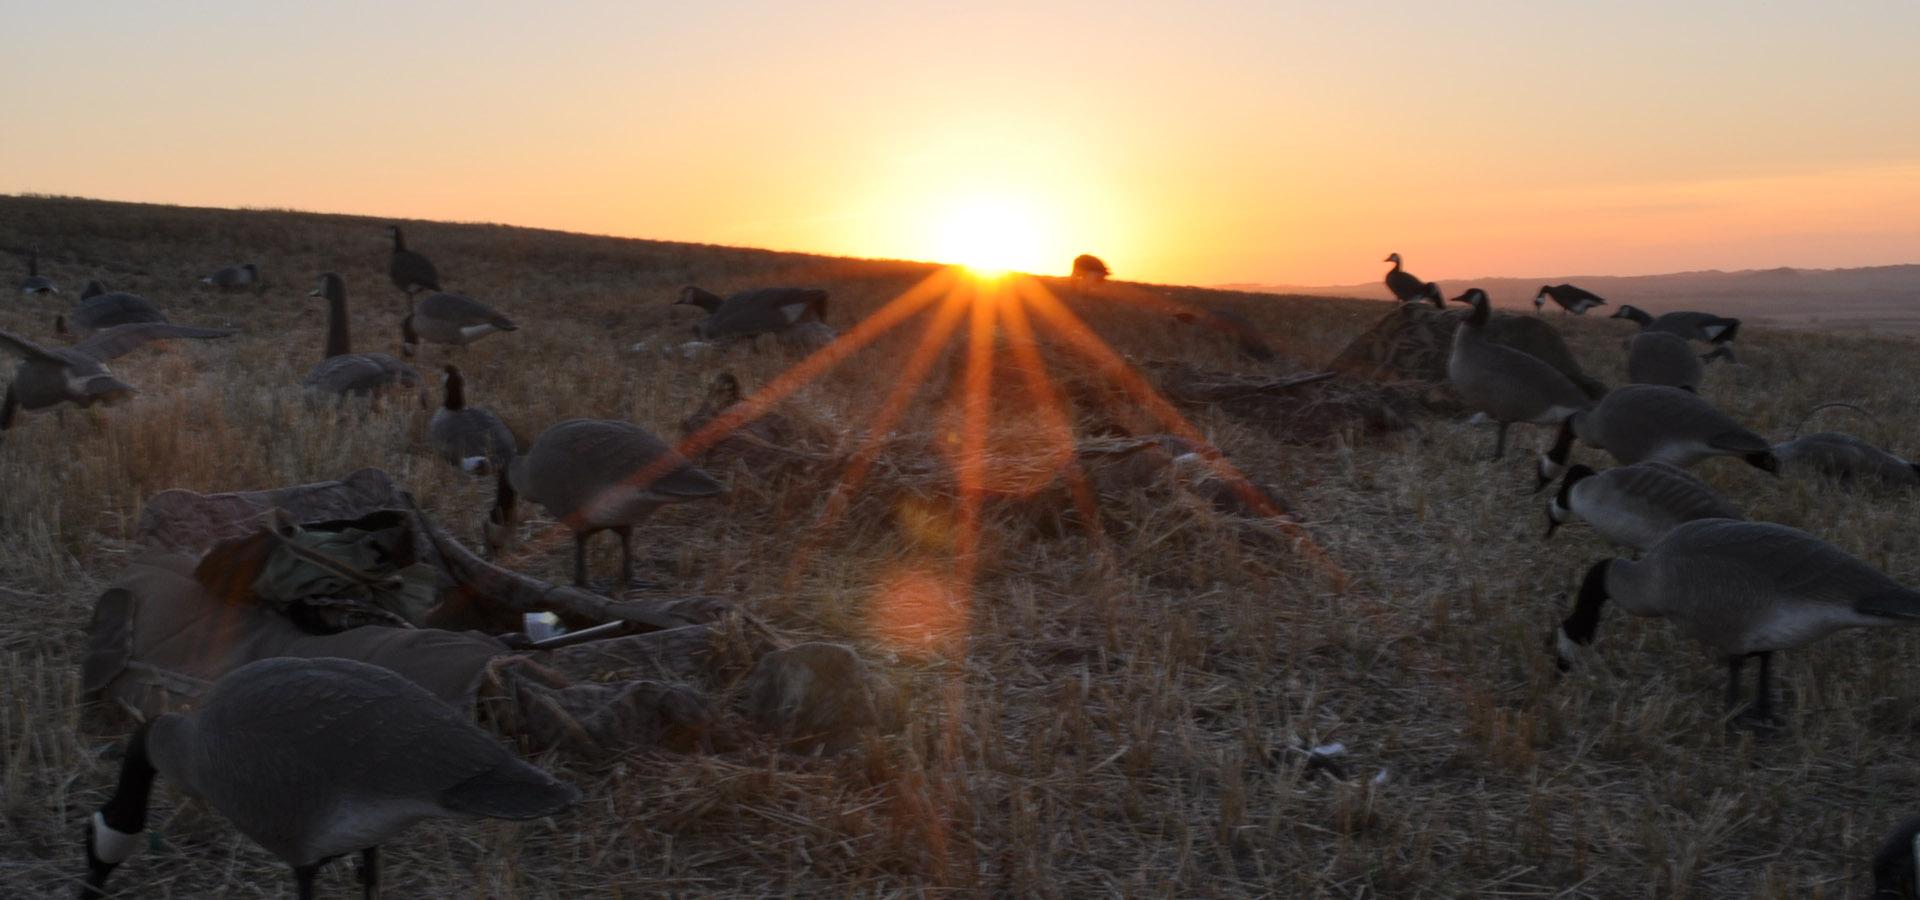 Saskatchewan Canada Waterfowl Hunting